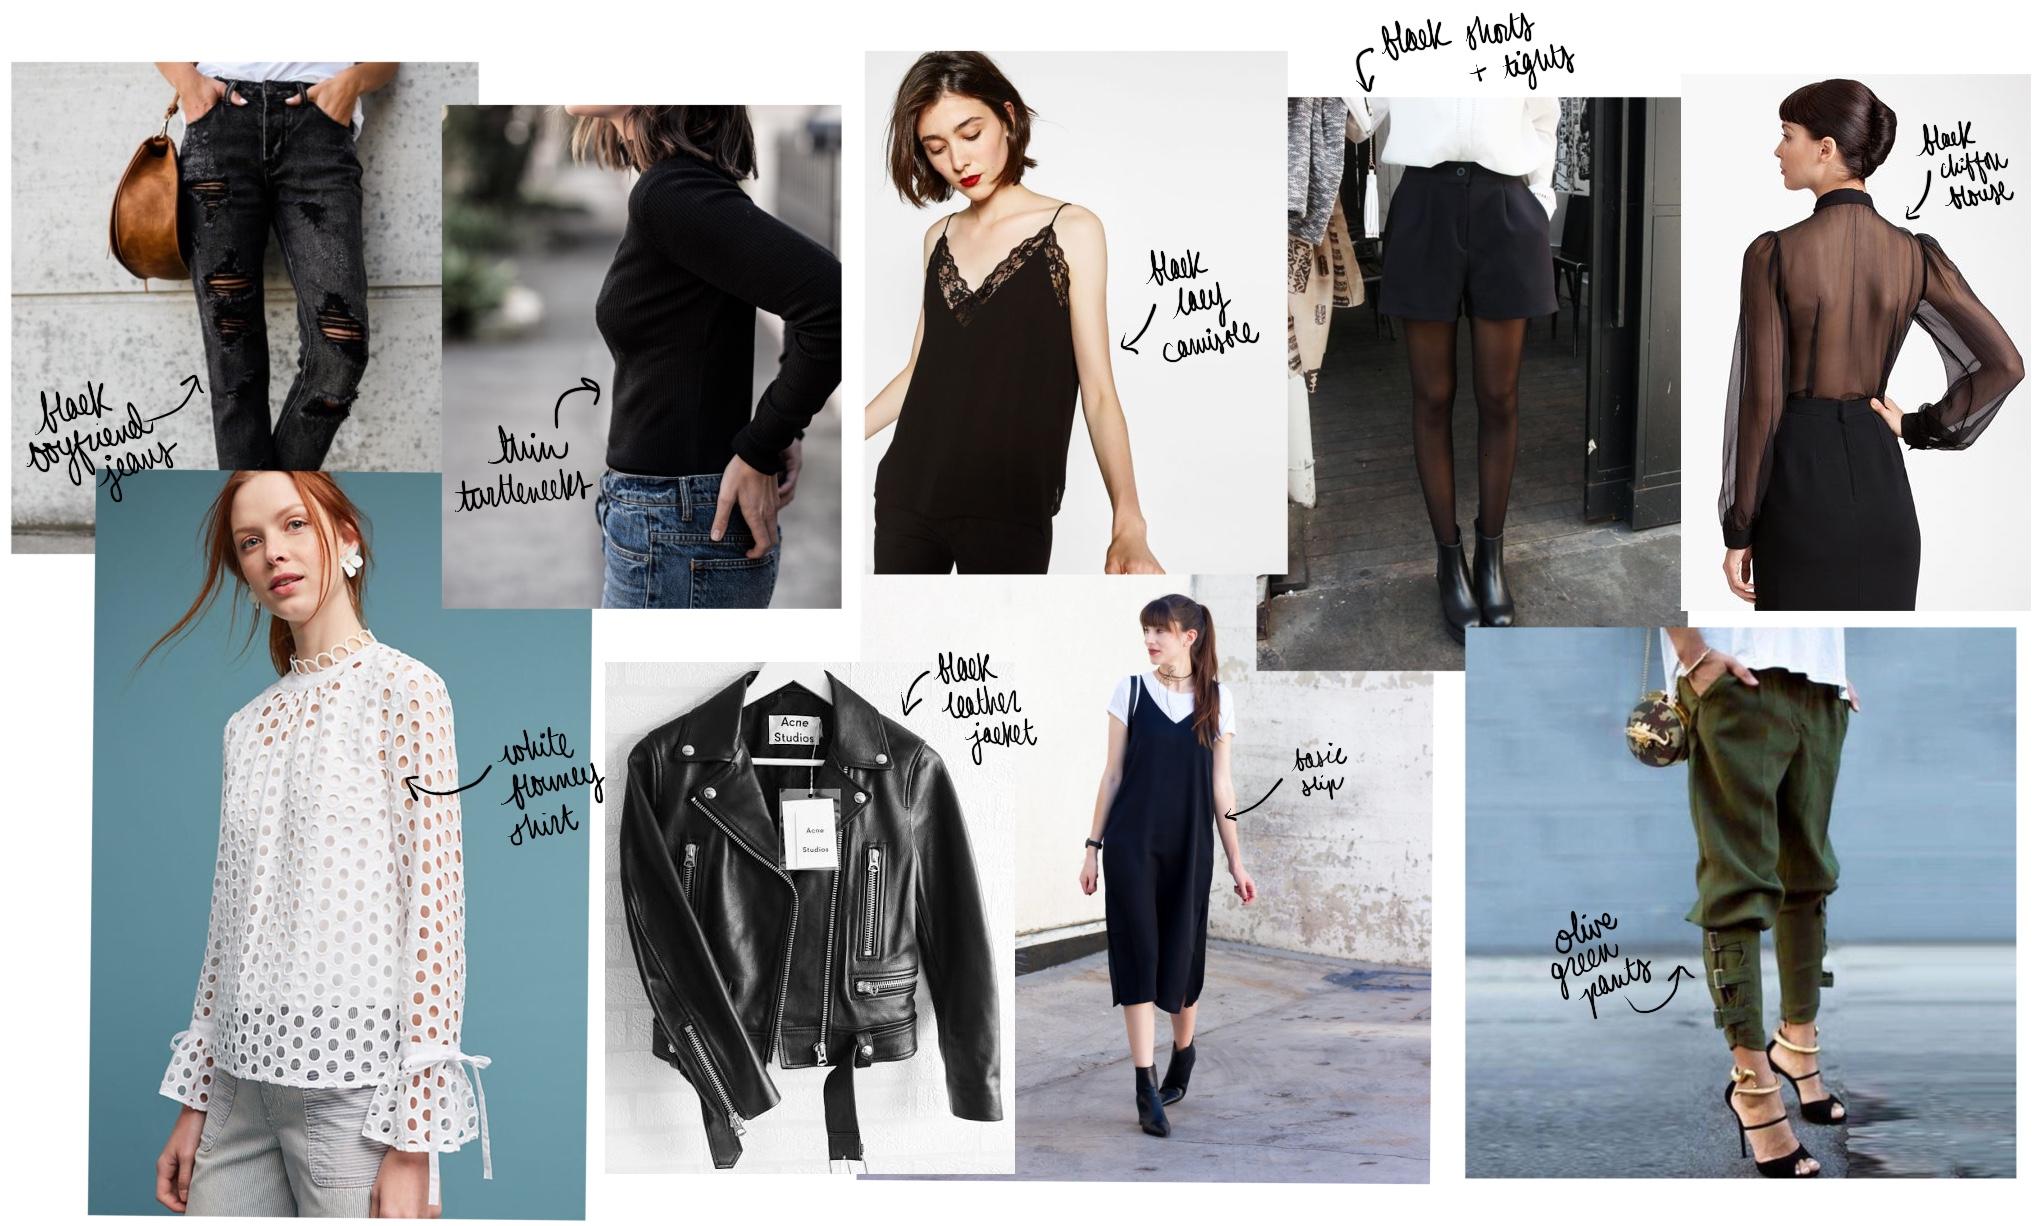 Images via respective links:    black jeans   ,    turtlenecks   ,    white shirt   ,    slip dress   ,    black shorts   ,    tights   ,    olive pants   ,    leather jacket   ,    black blouse   ,    black camisole   .